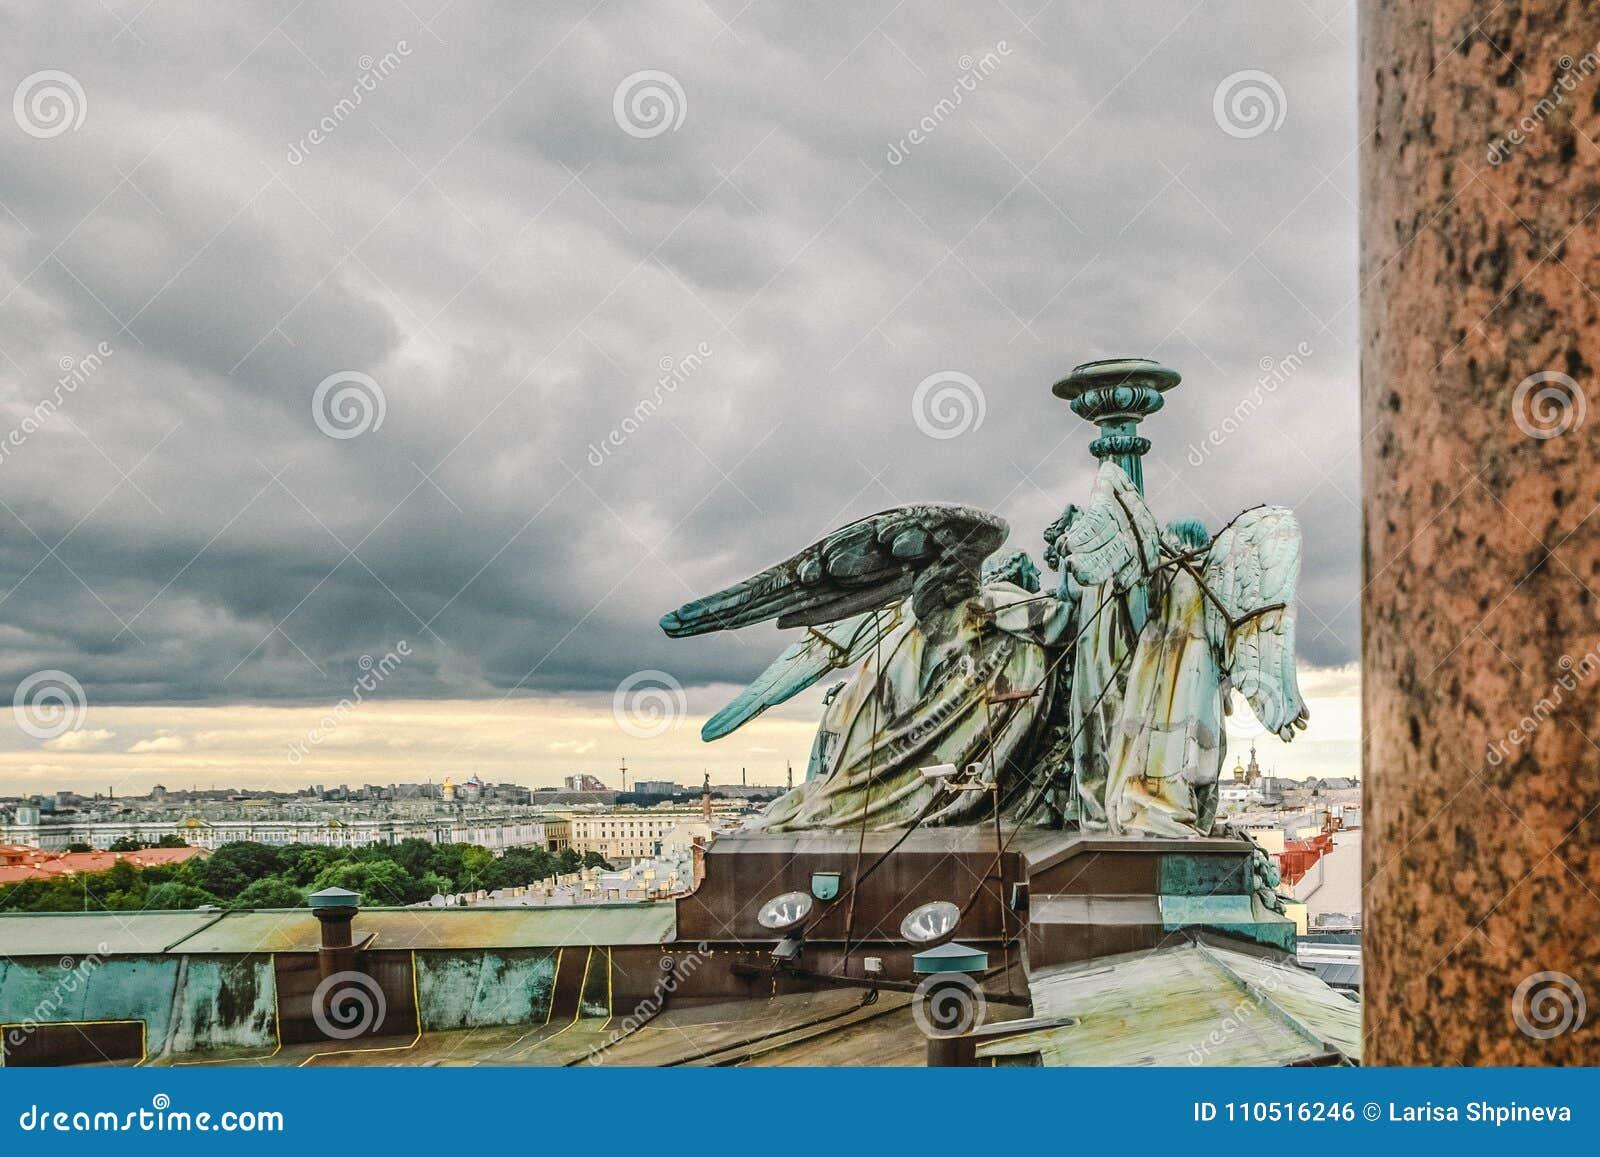 Angels originally from St. Petersburg 4